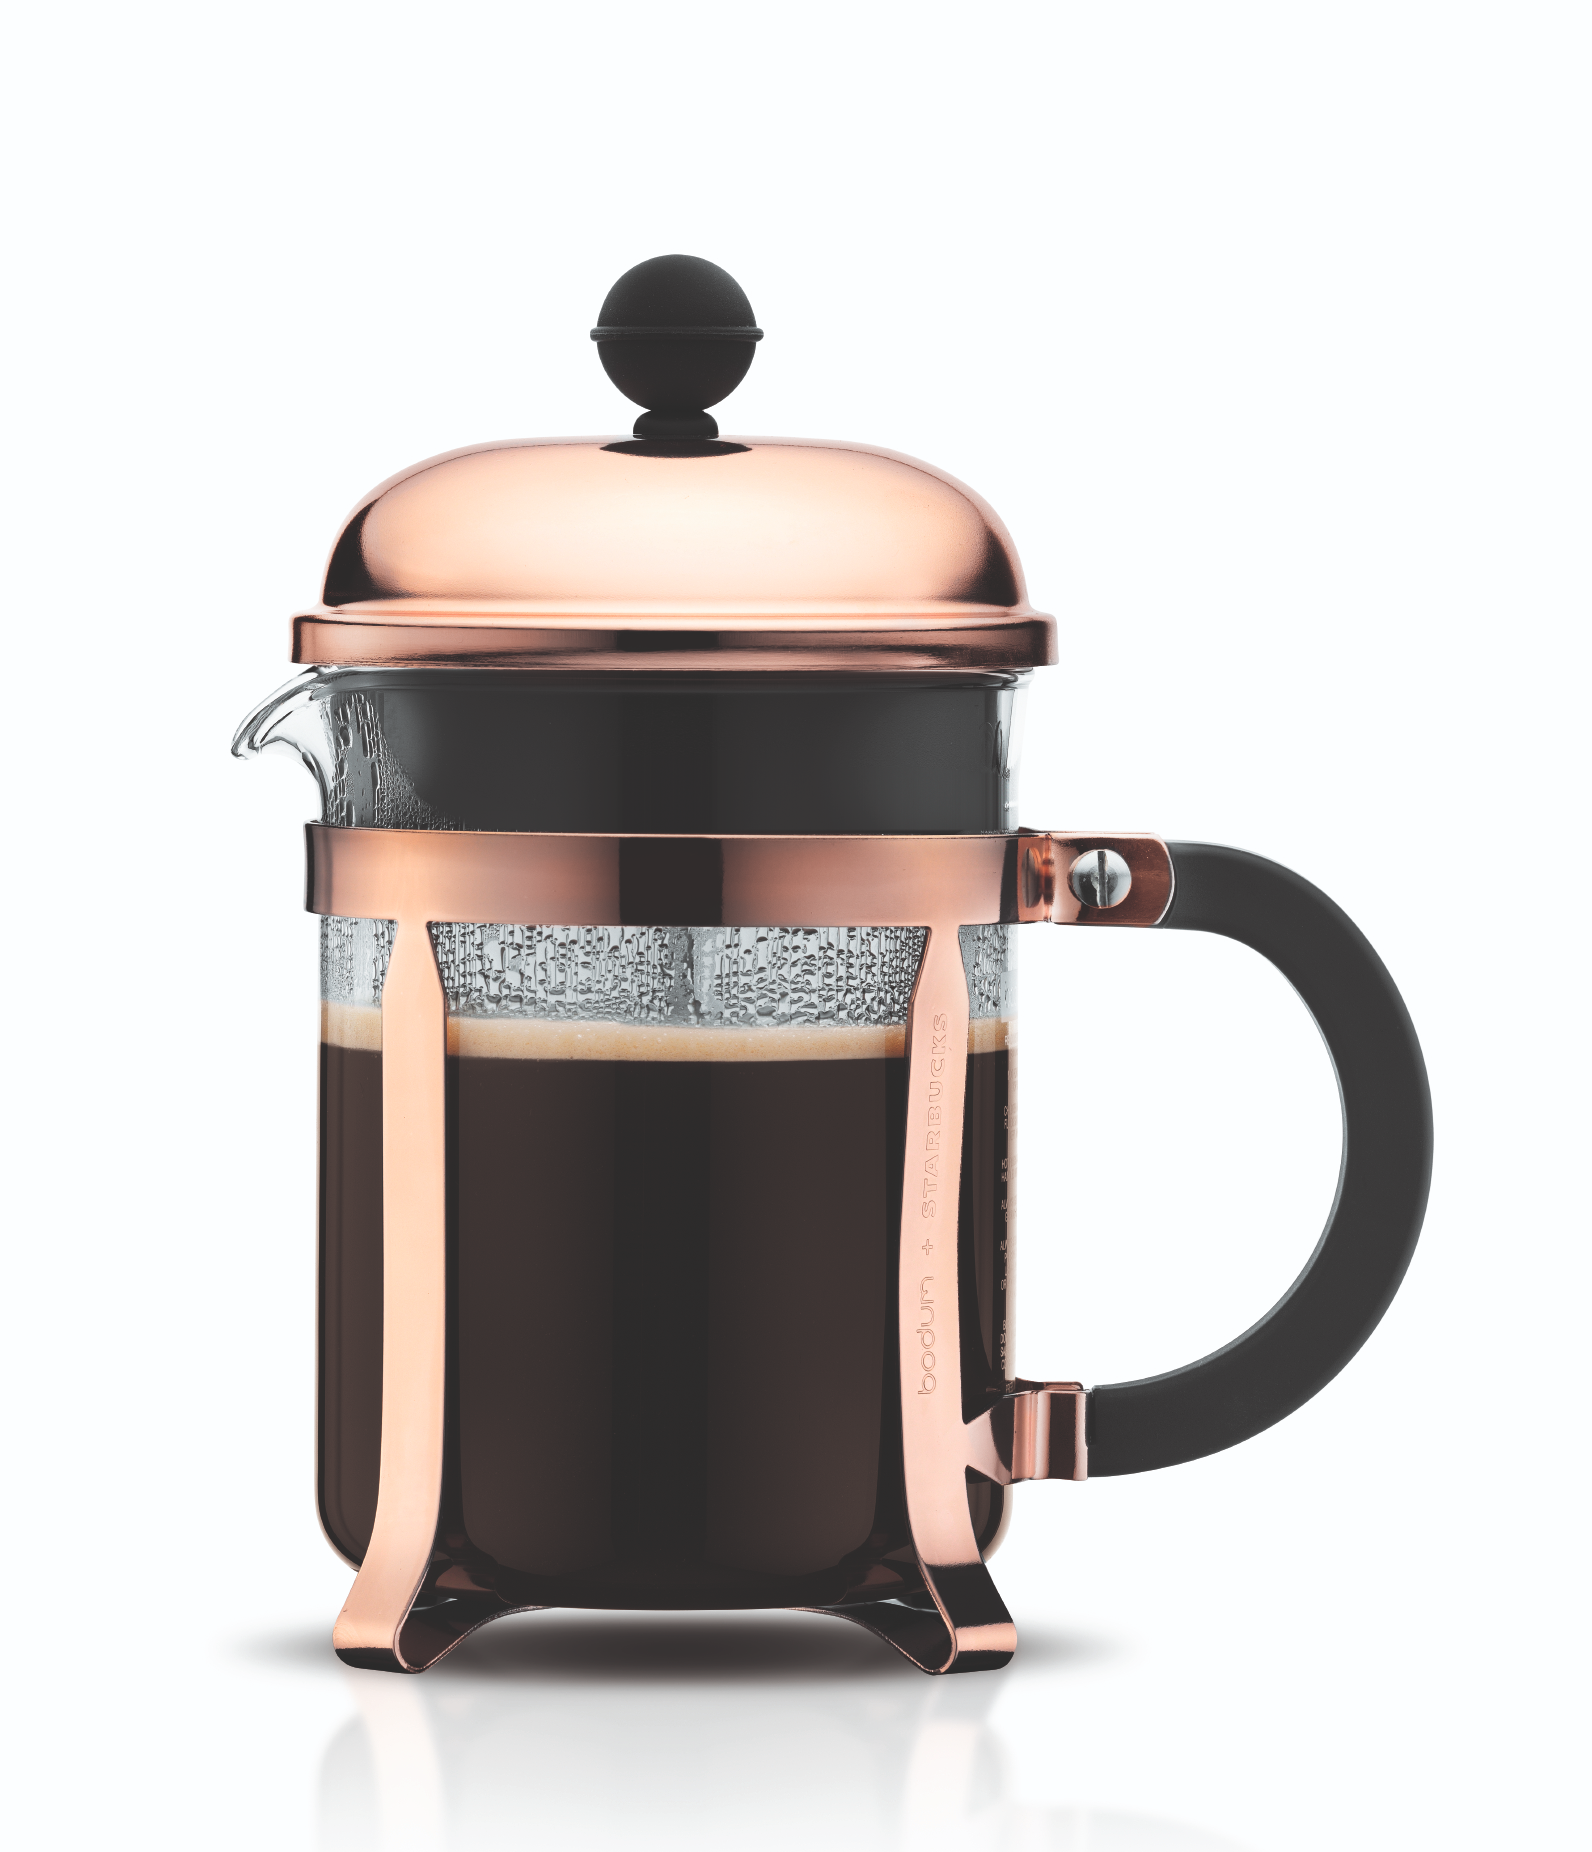 Bodum Cafeti?re Chambord Zwart/Koper 0.5 Liter